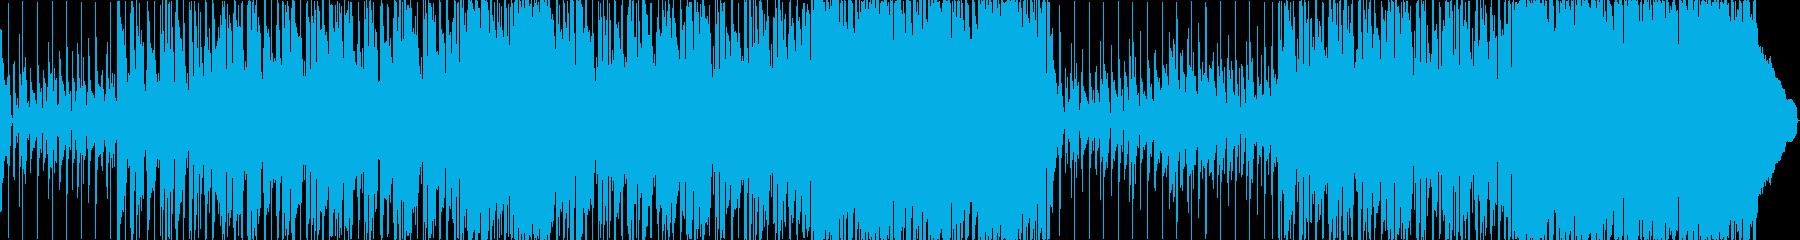 Bright guitar pop's reproduced waveform